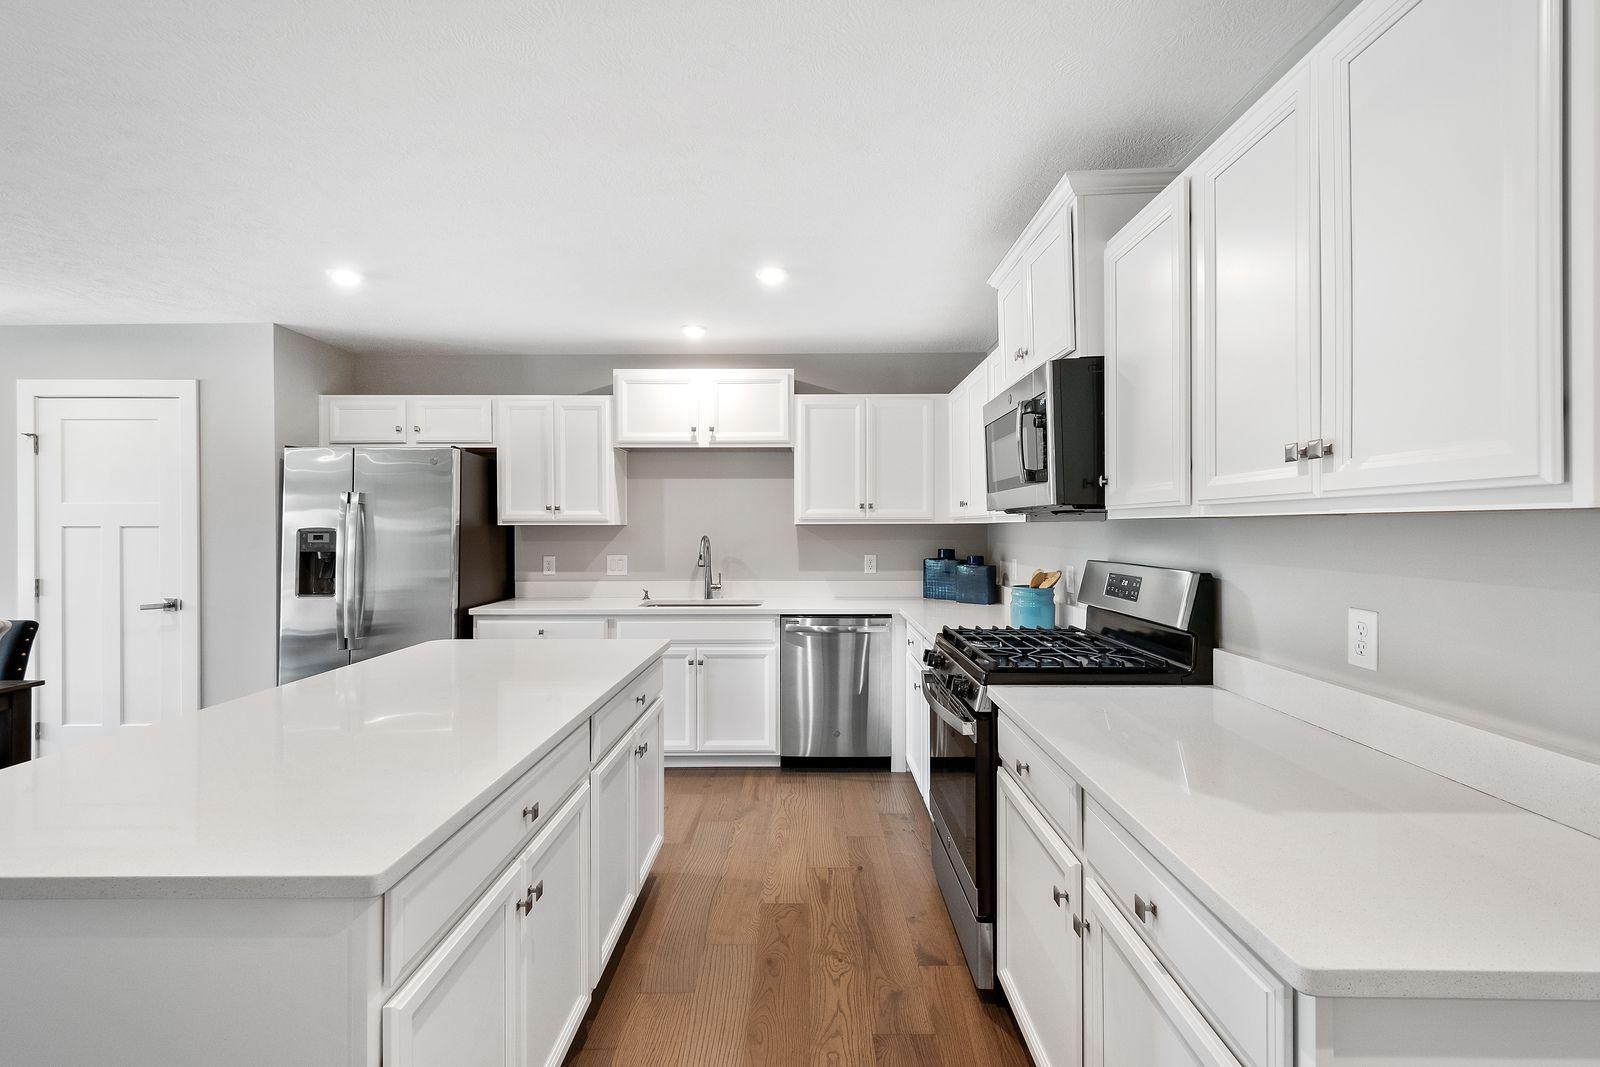 Kitchen featured in the Turks & Caicos. By Ryan Homes in Harrisonburg, VA